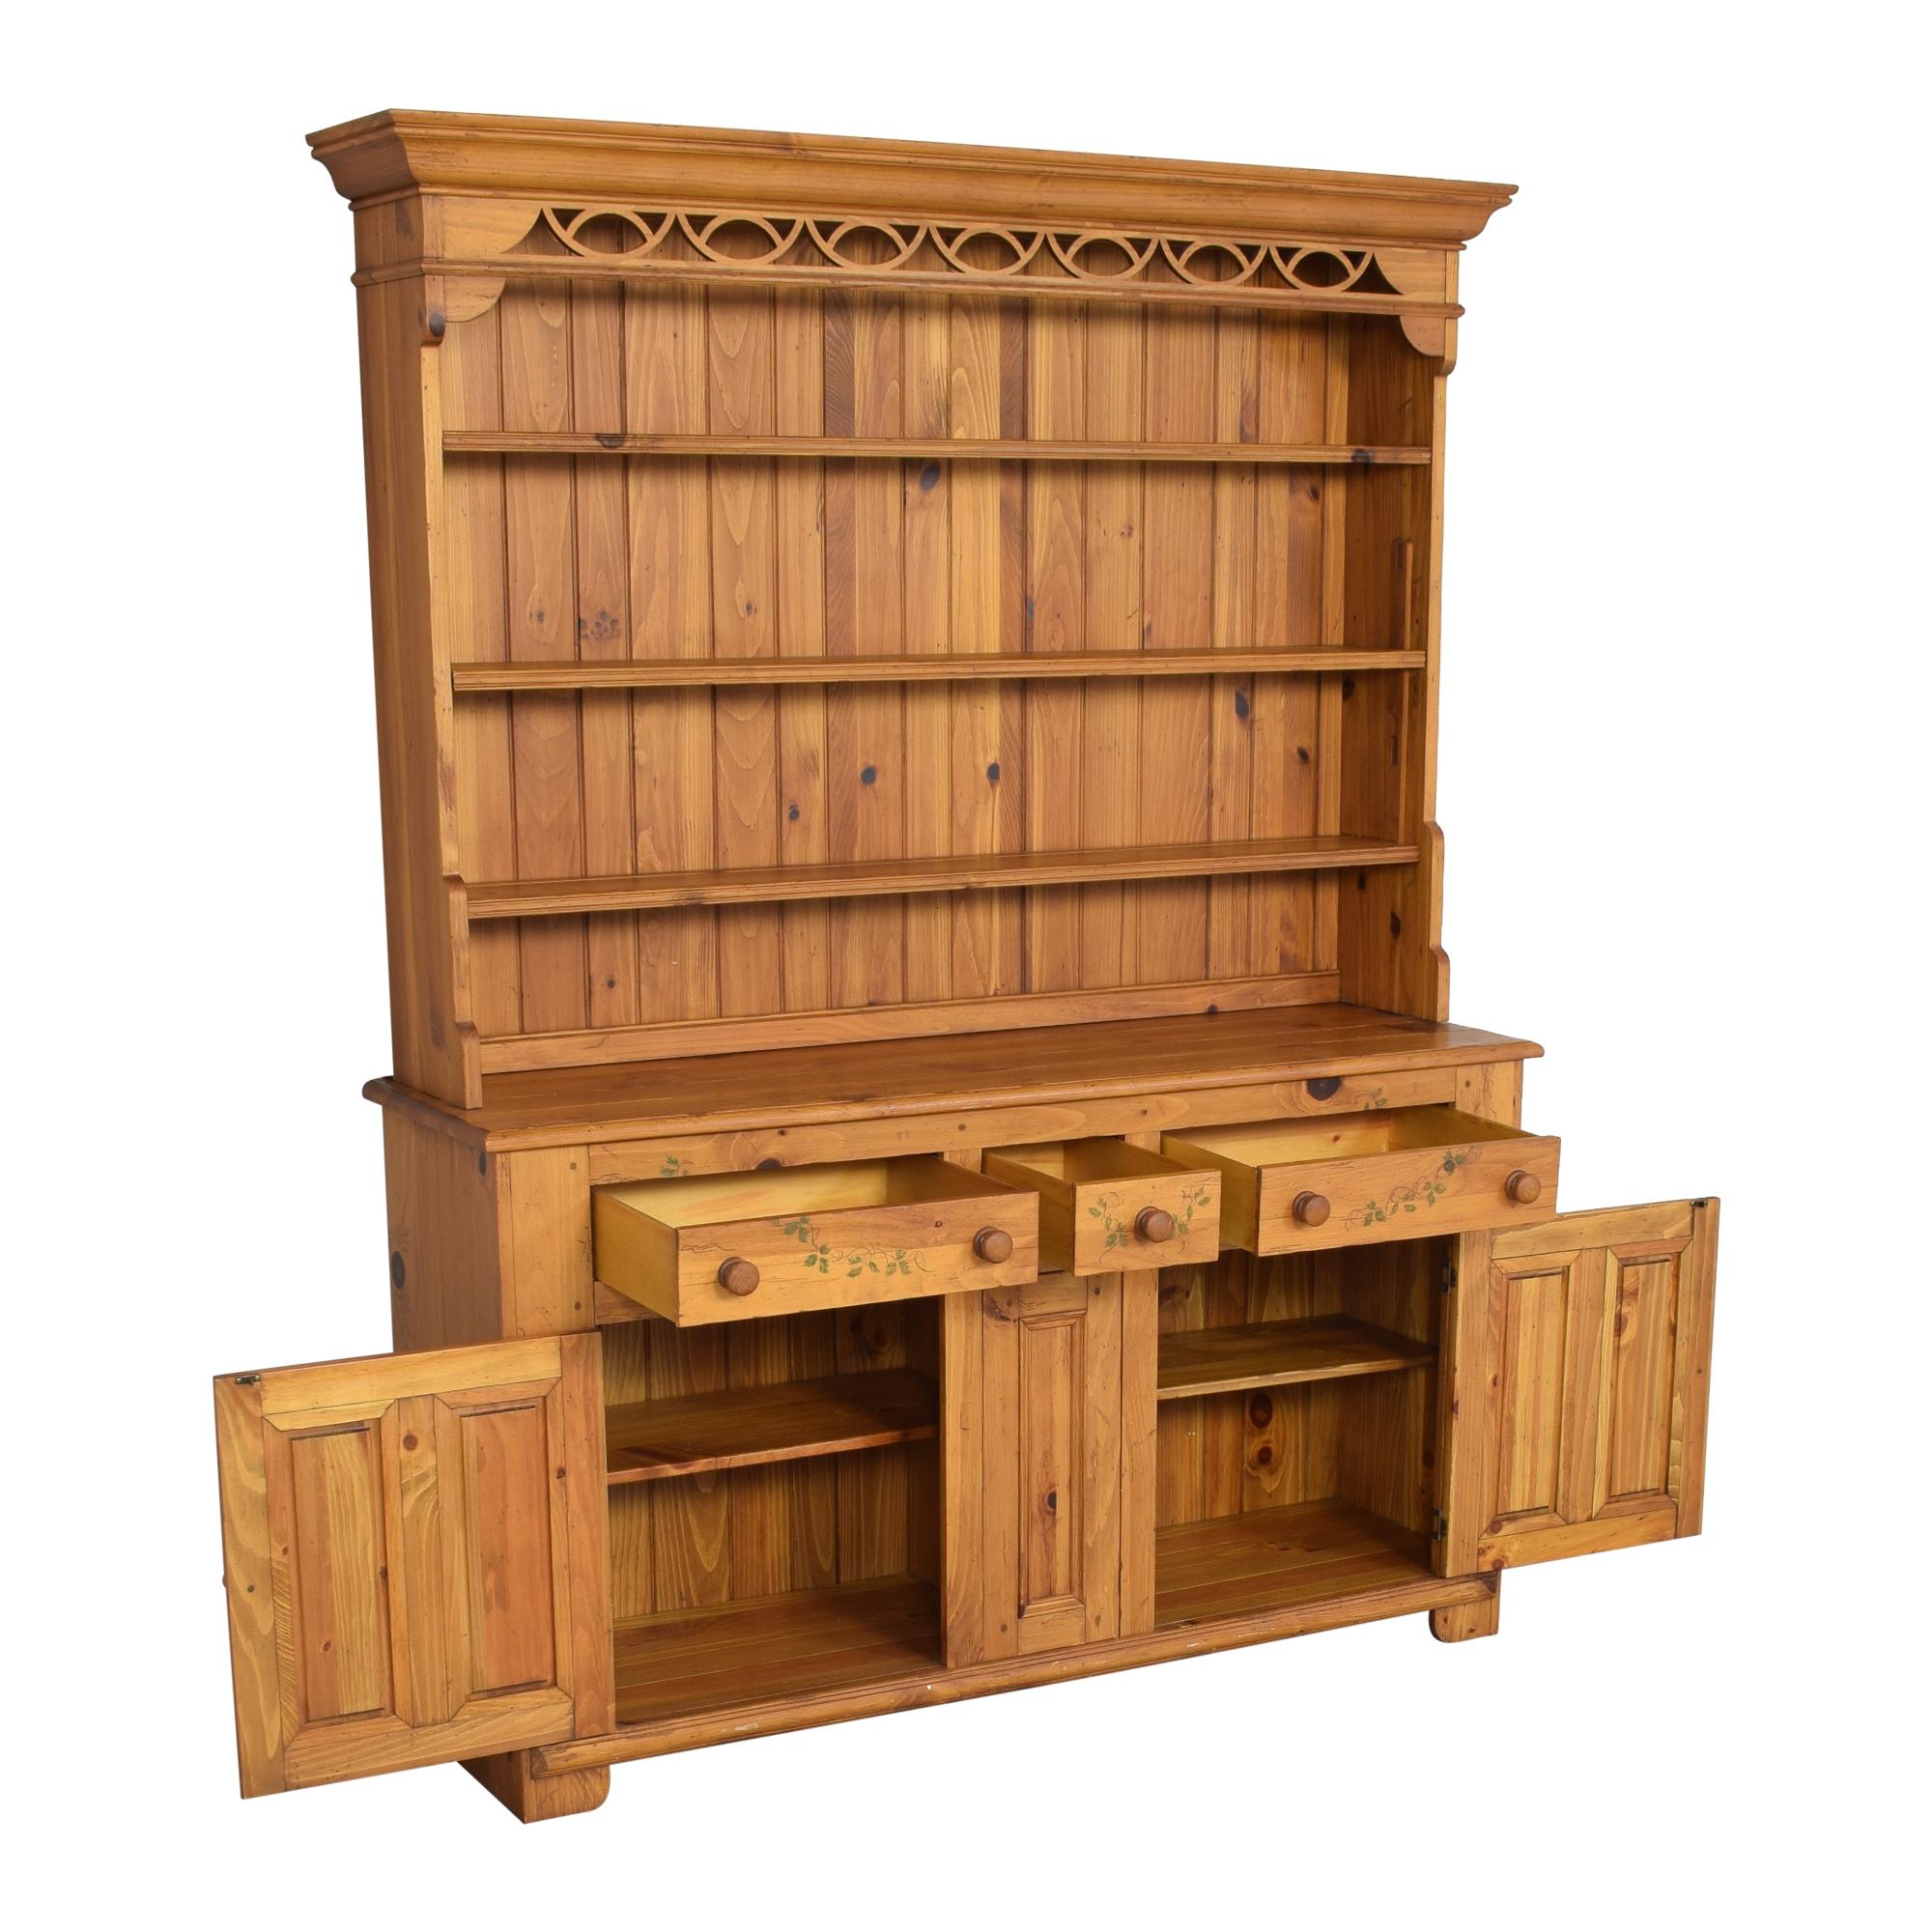 Ethan Allen Ethan Allen Hutch with Cabinets Storage